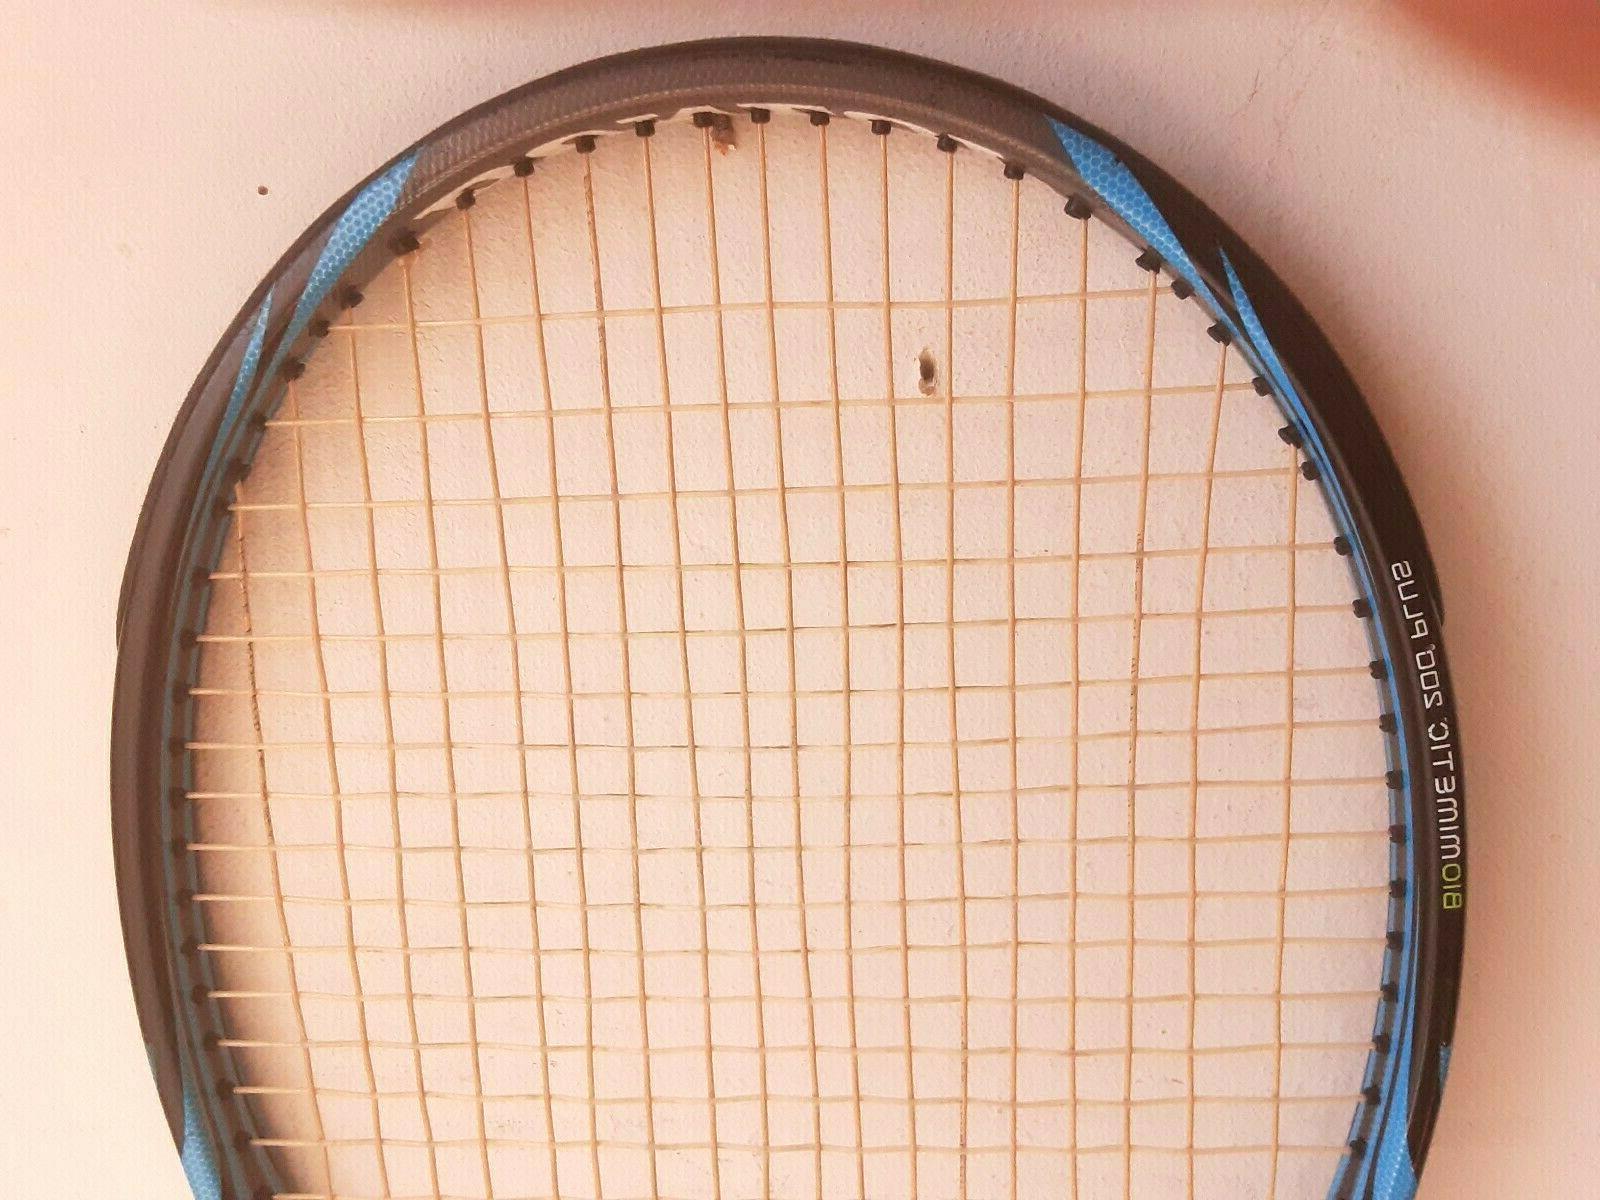 Dunlop Biomimetic 3/8 Racquet